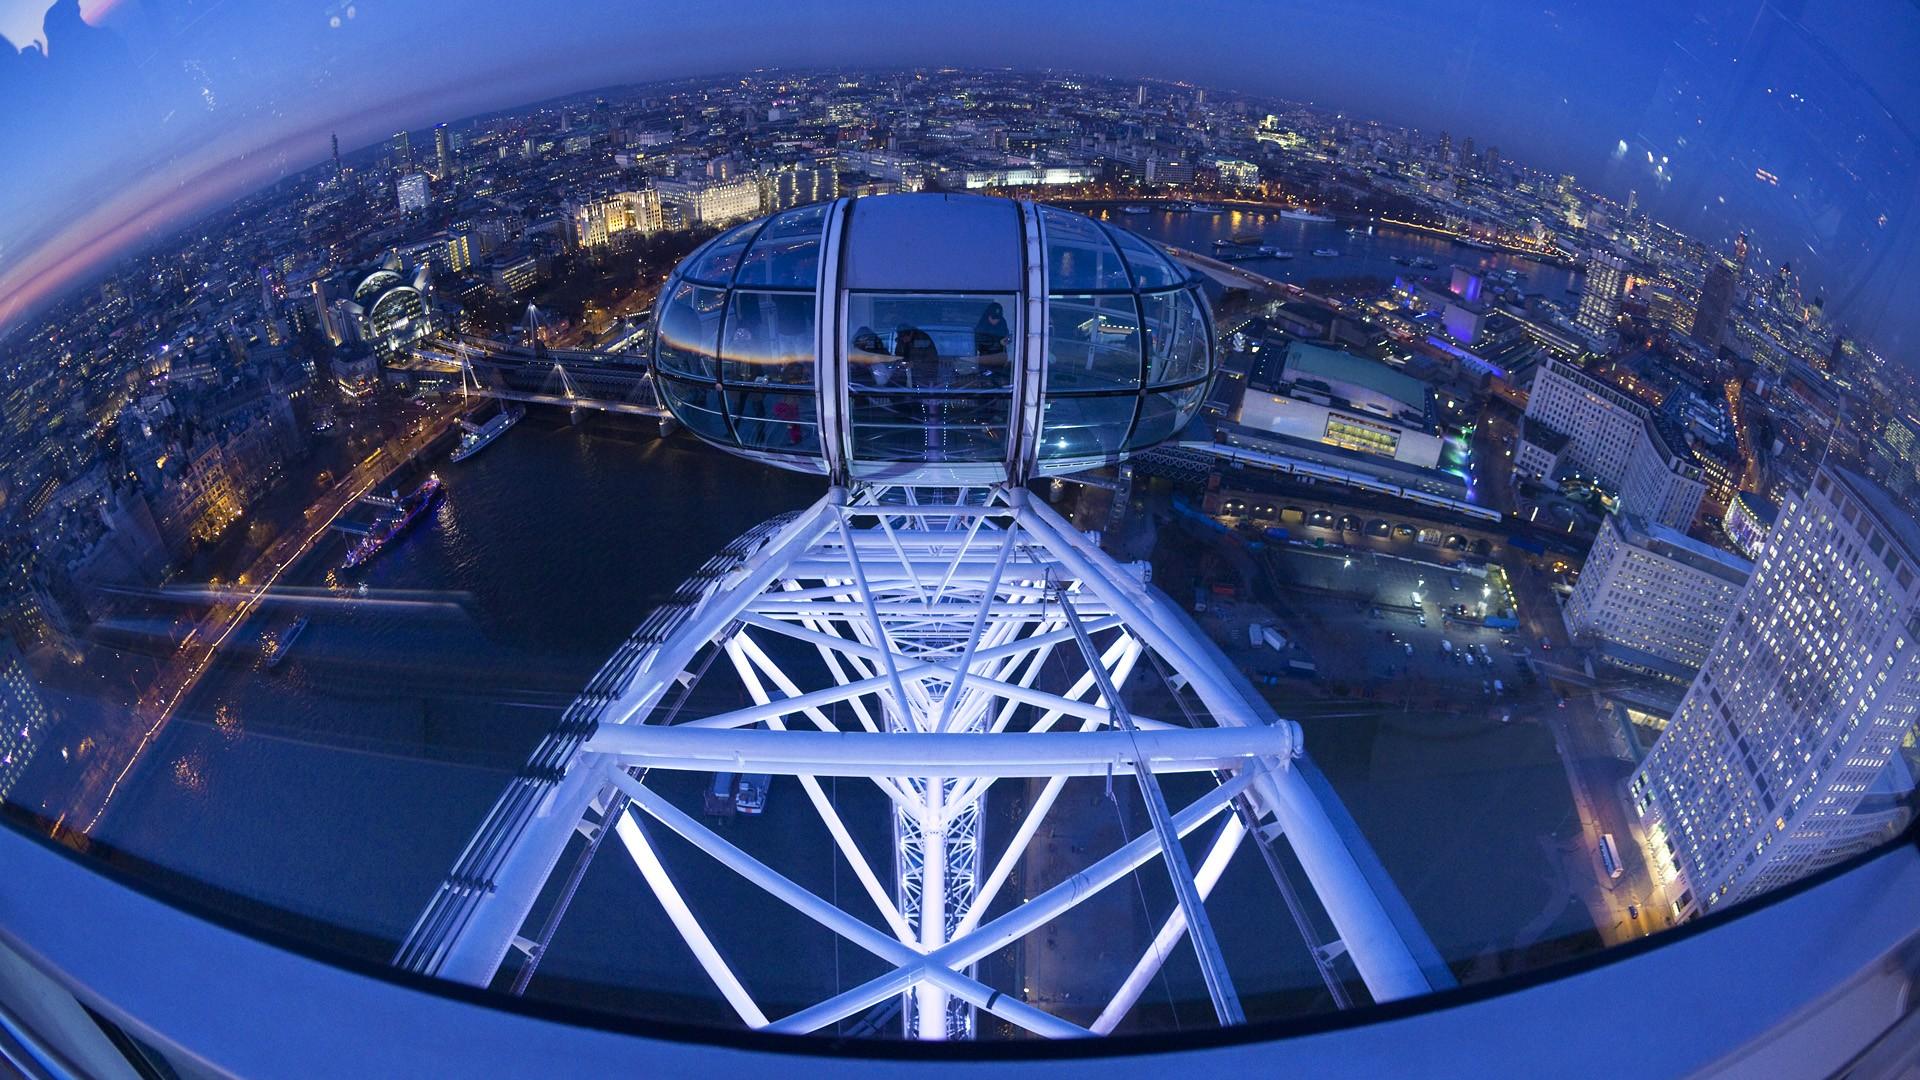 General 1920x1080 London England city cityscape London Eye ferris wheel